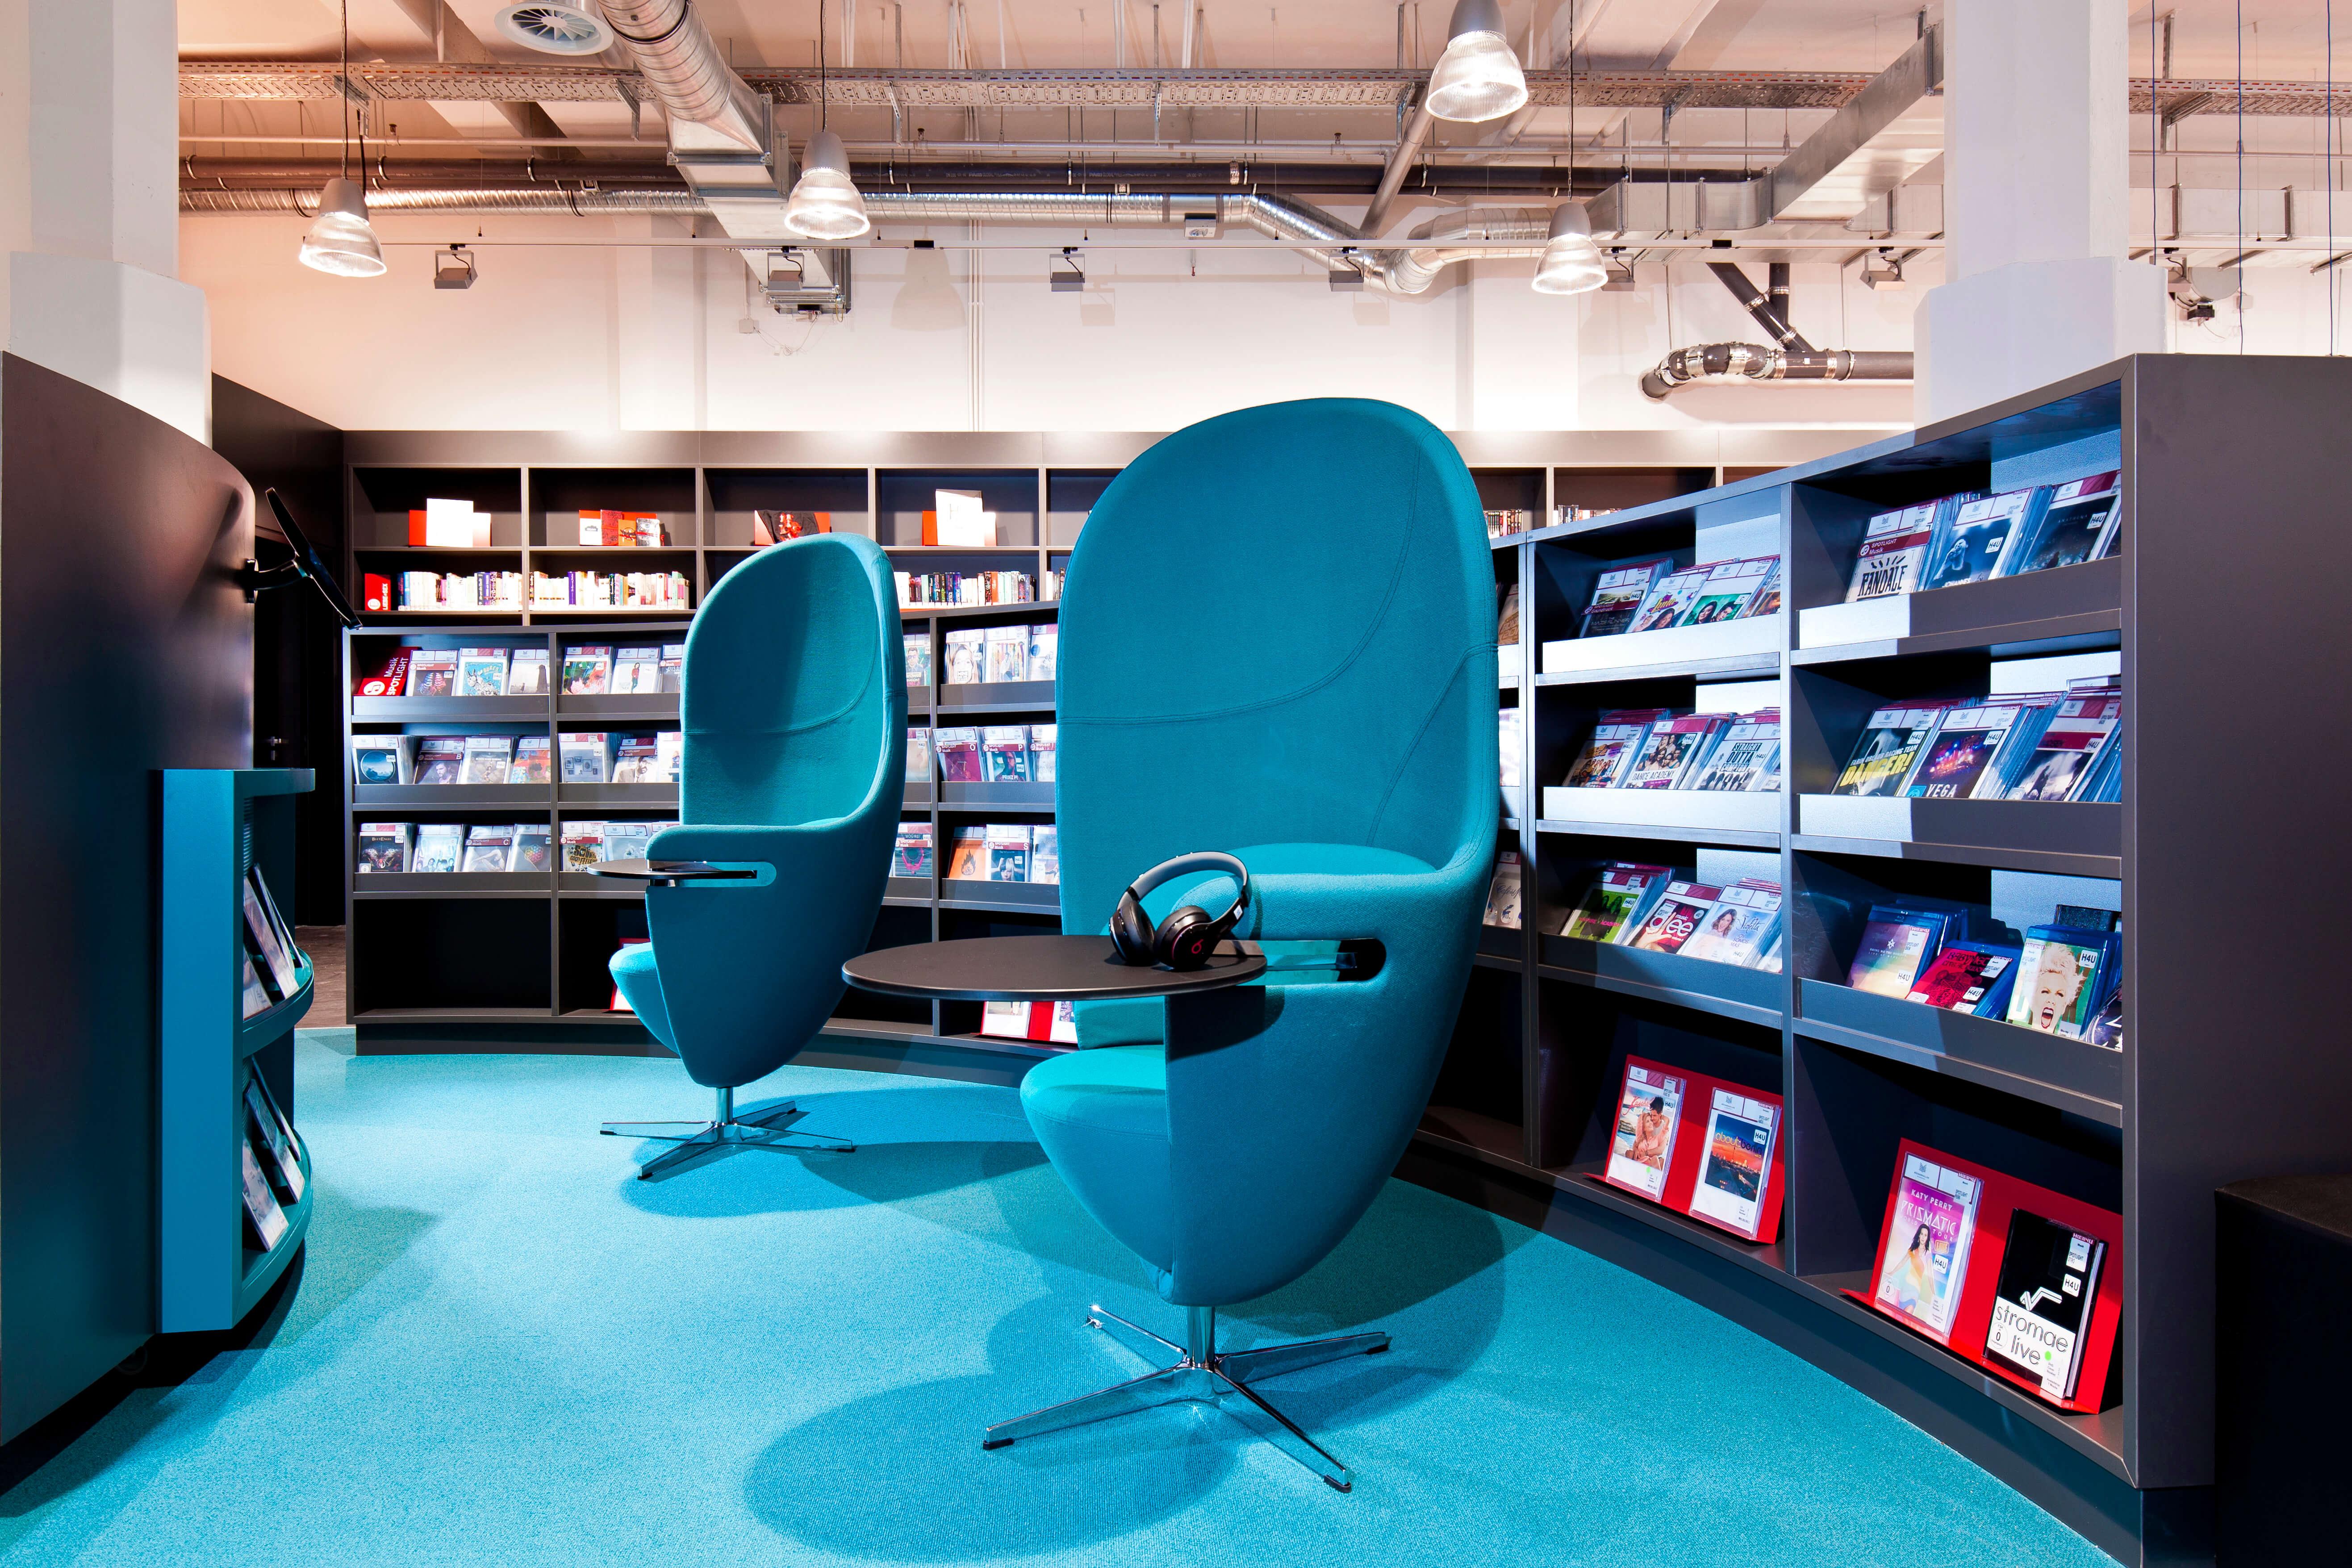 Hoeb4U – Freizeitbibliothek